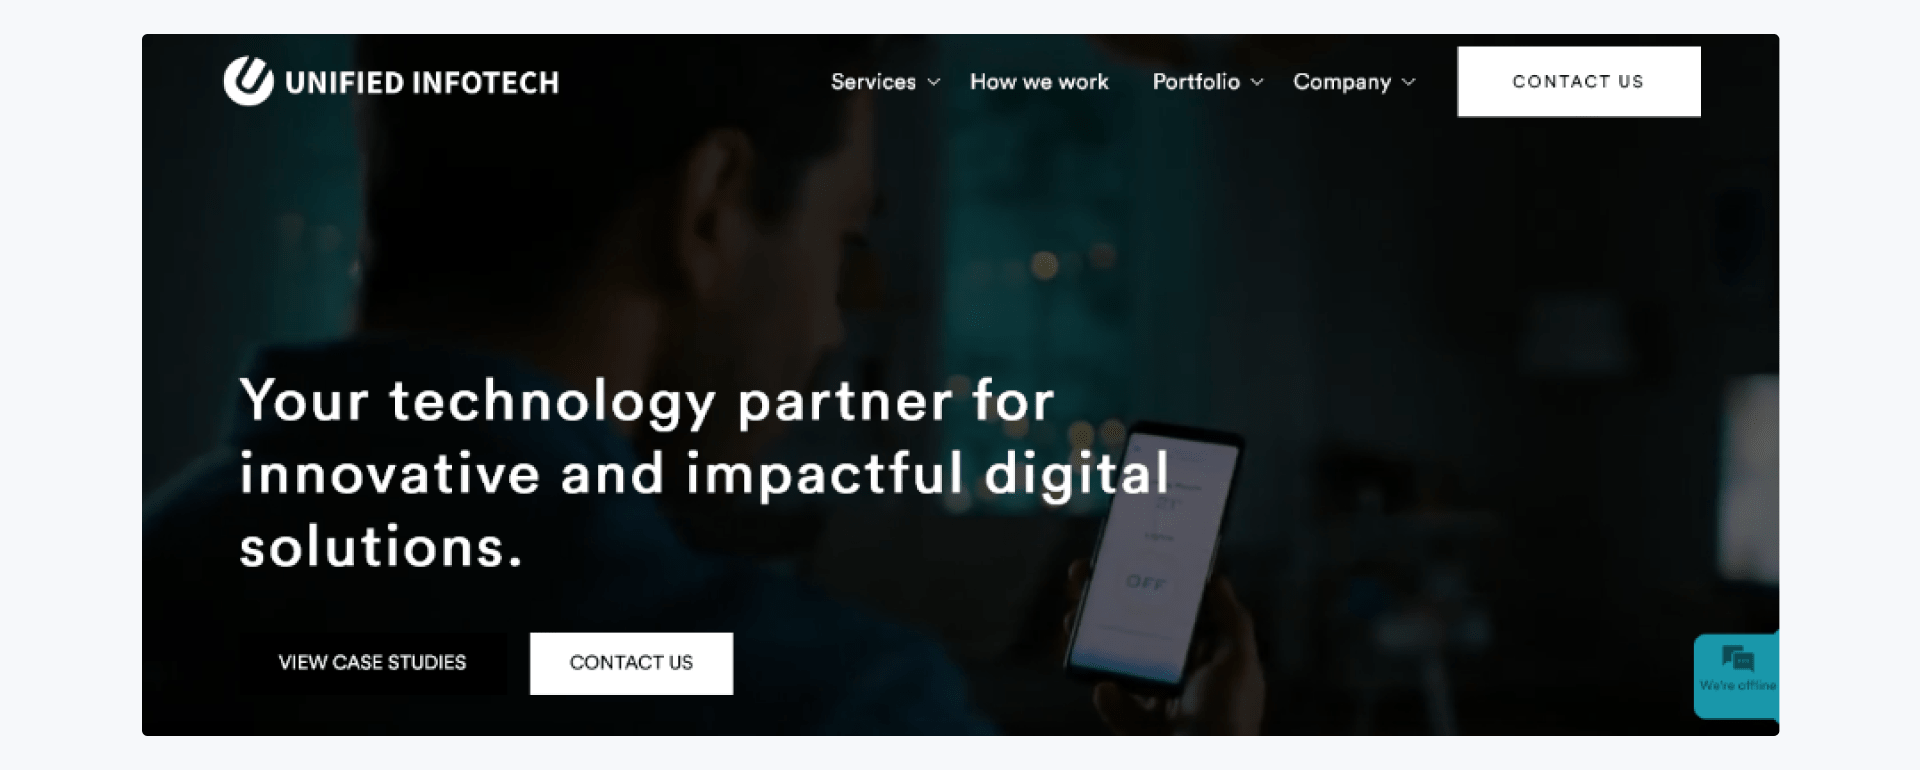 Unified Infotech - development company home page